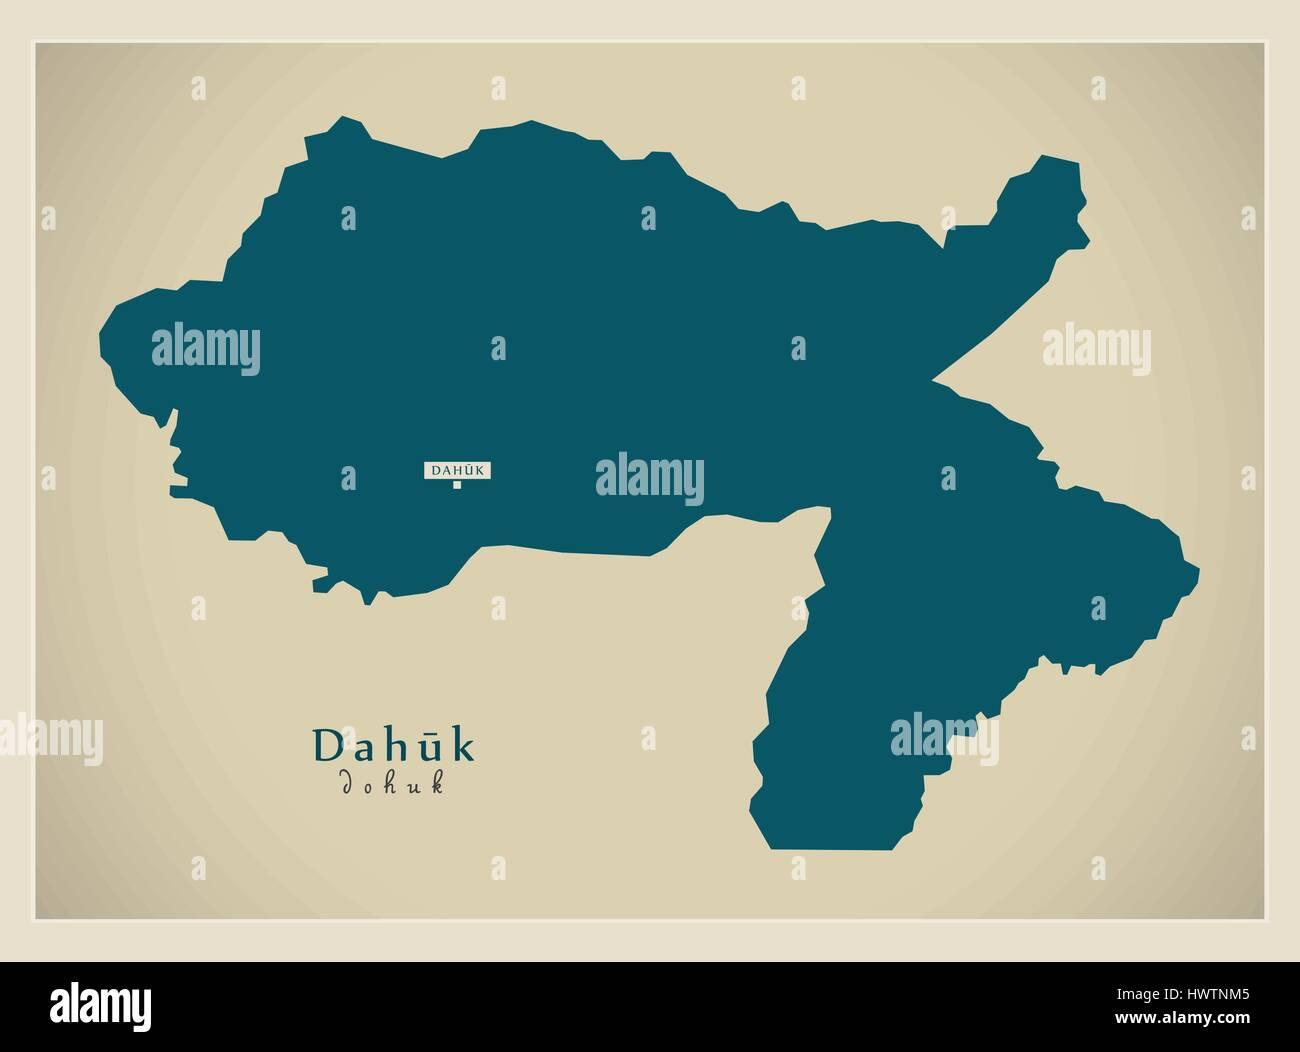 Modern Map - Dahuk IQ Stock Vector Art & Illustration ...